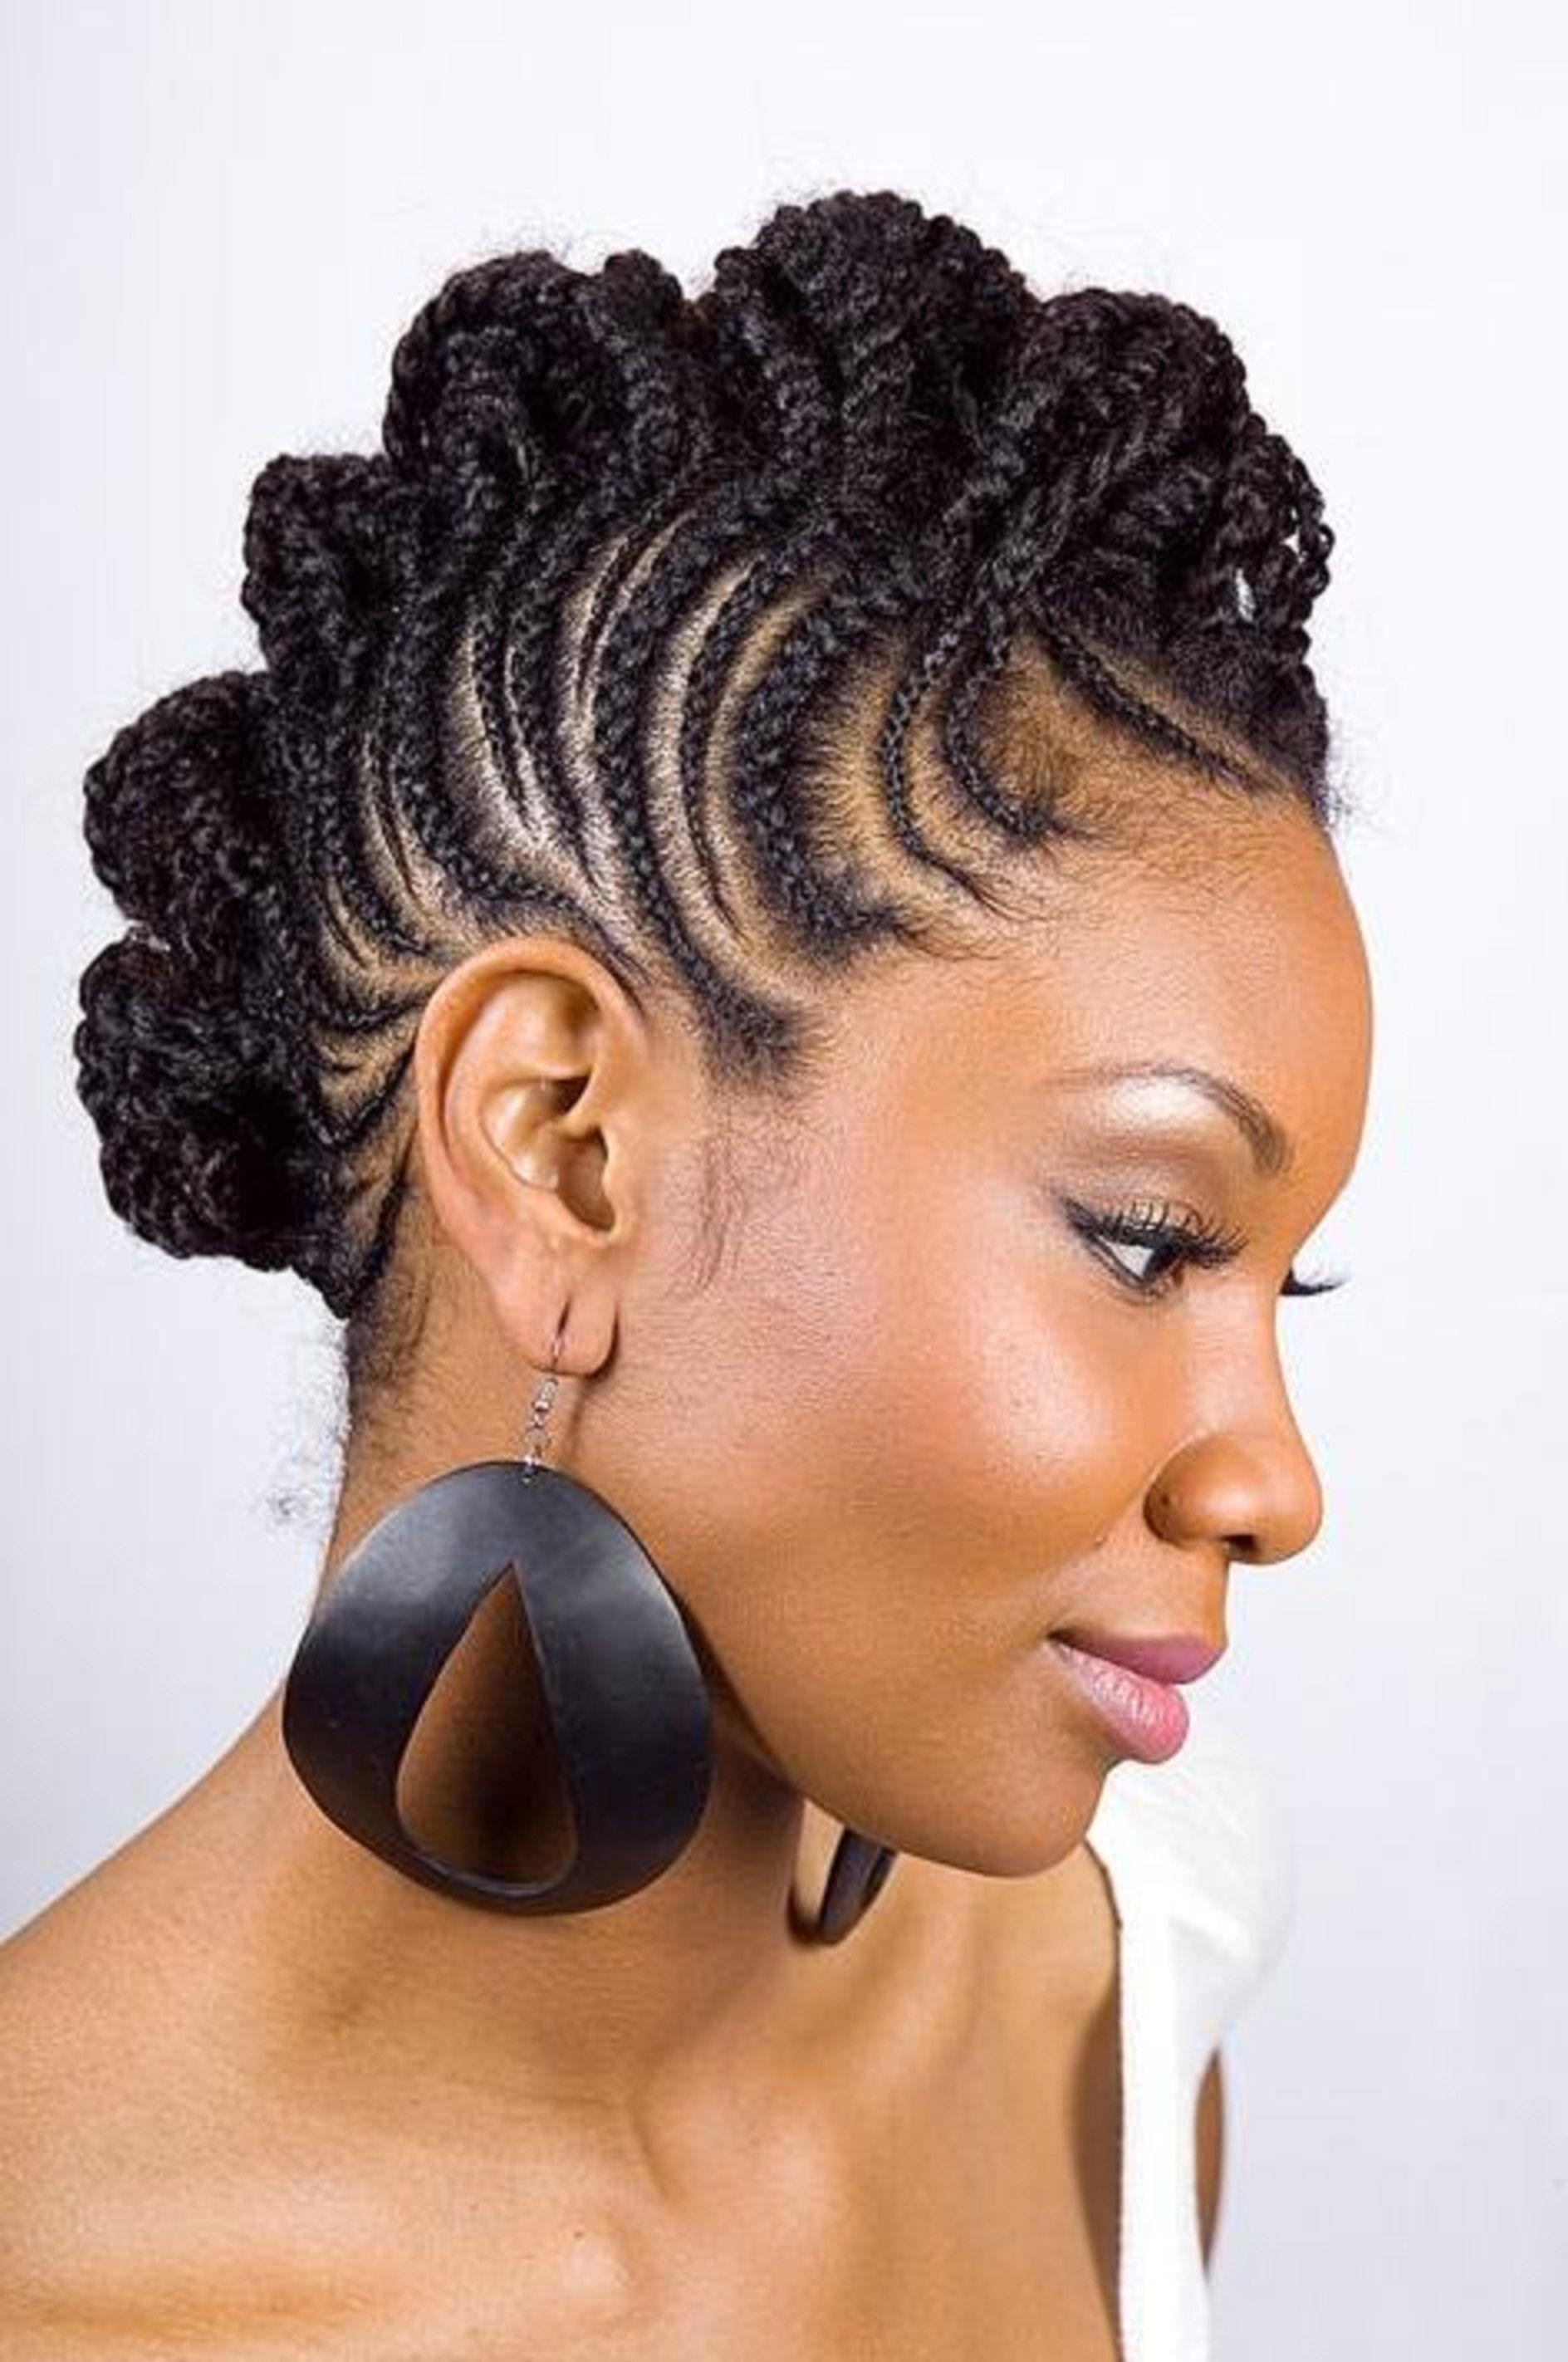 Hair styles, Womens hairstyles, Braided mohawk hairstyles